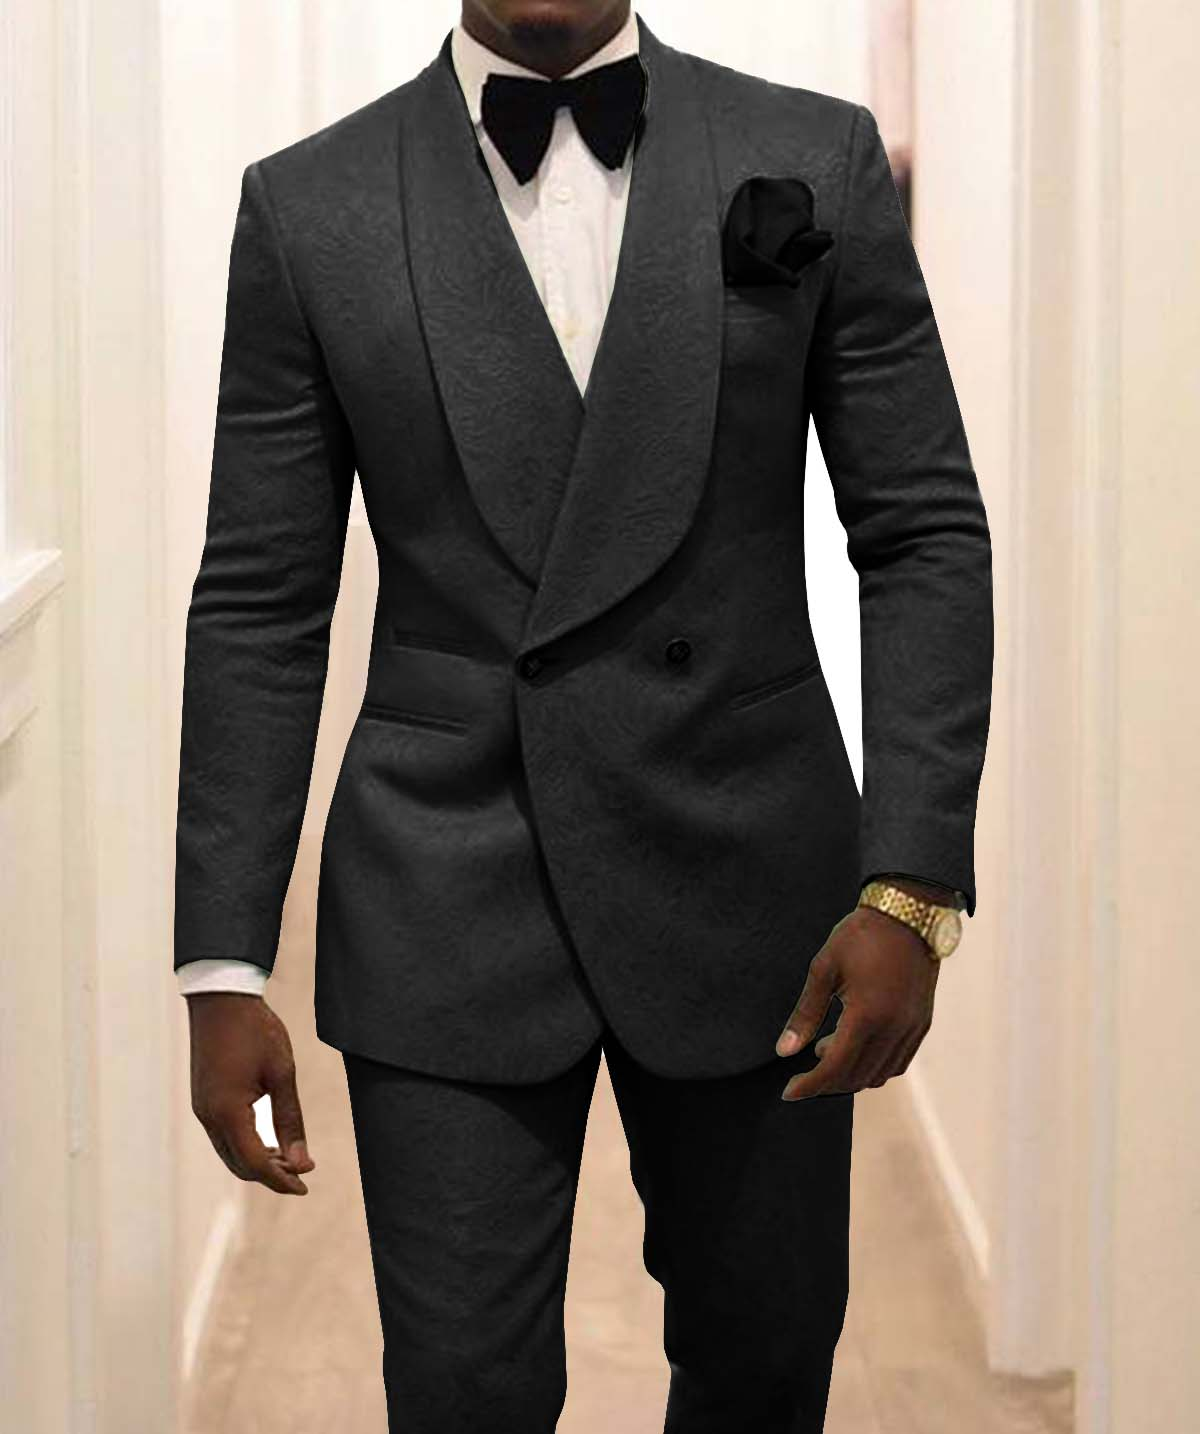 New Arrival Groomsmen Black Pattern Groom Tuxedos Shawl Lapel Men Suits 2 Pieces Wedding Best Man ( Jacket+Pants+Tie ) C926